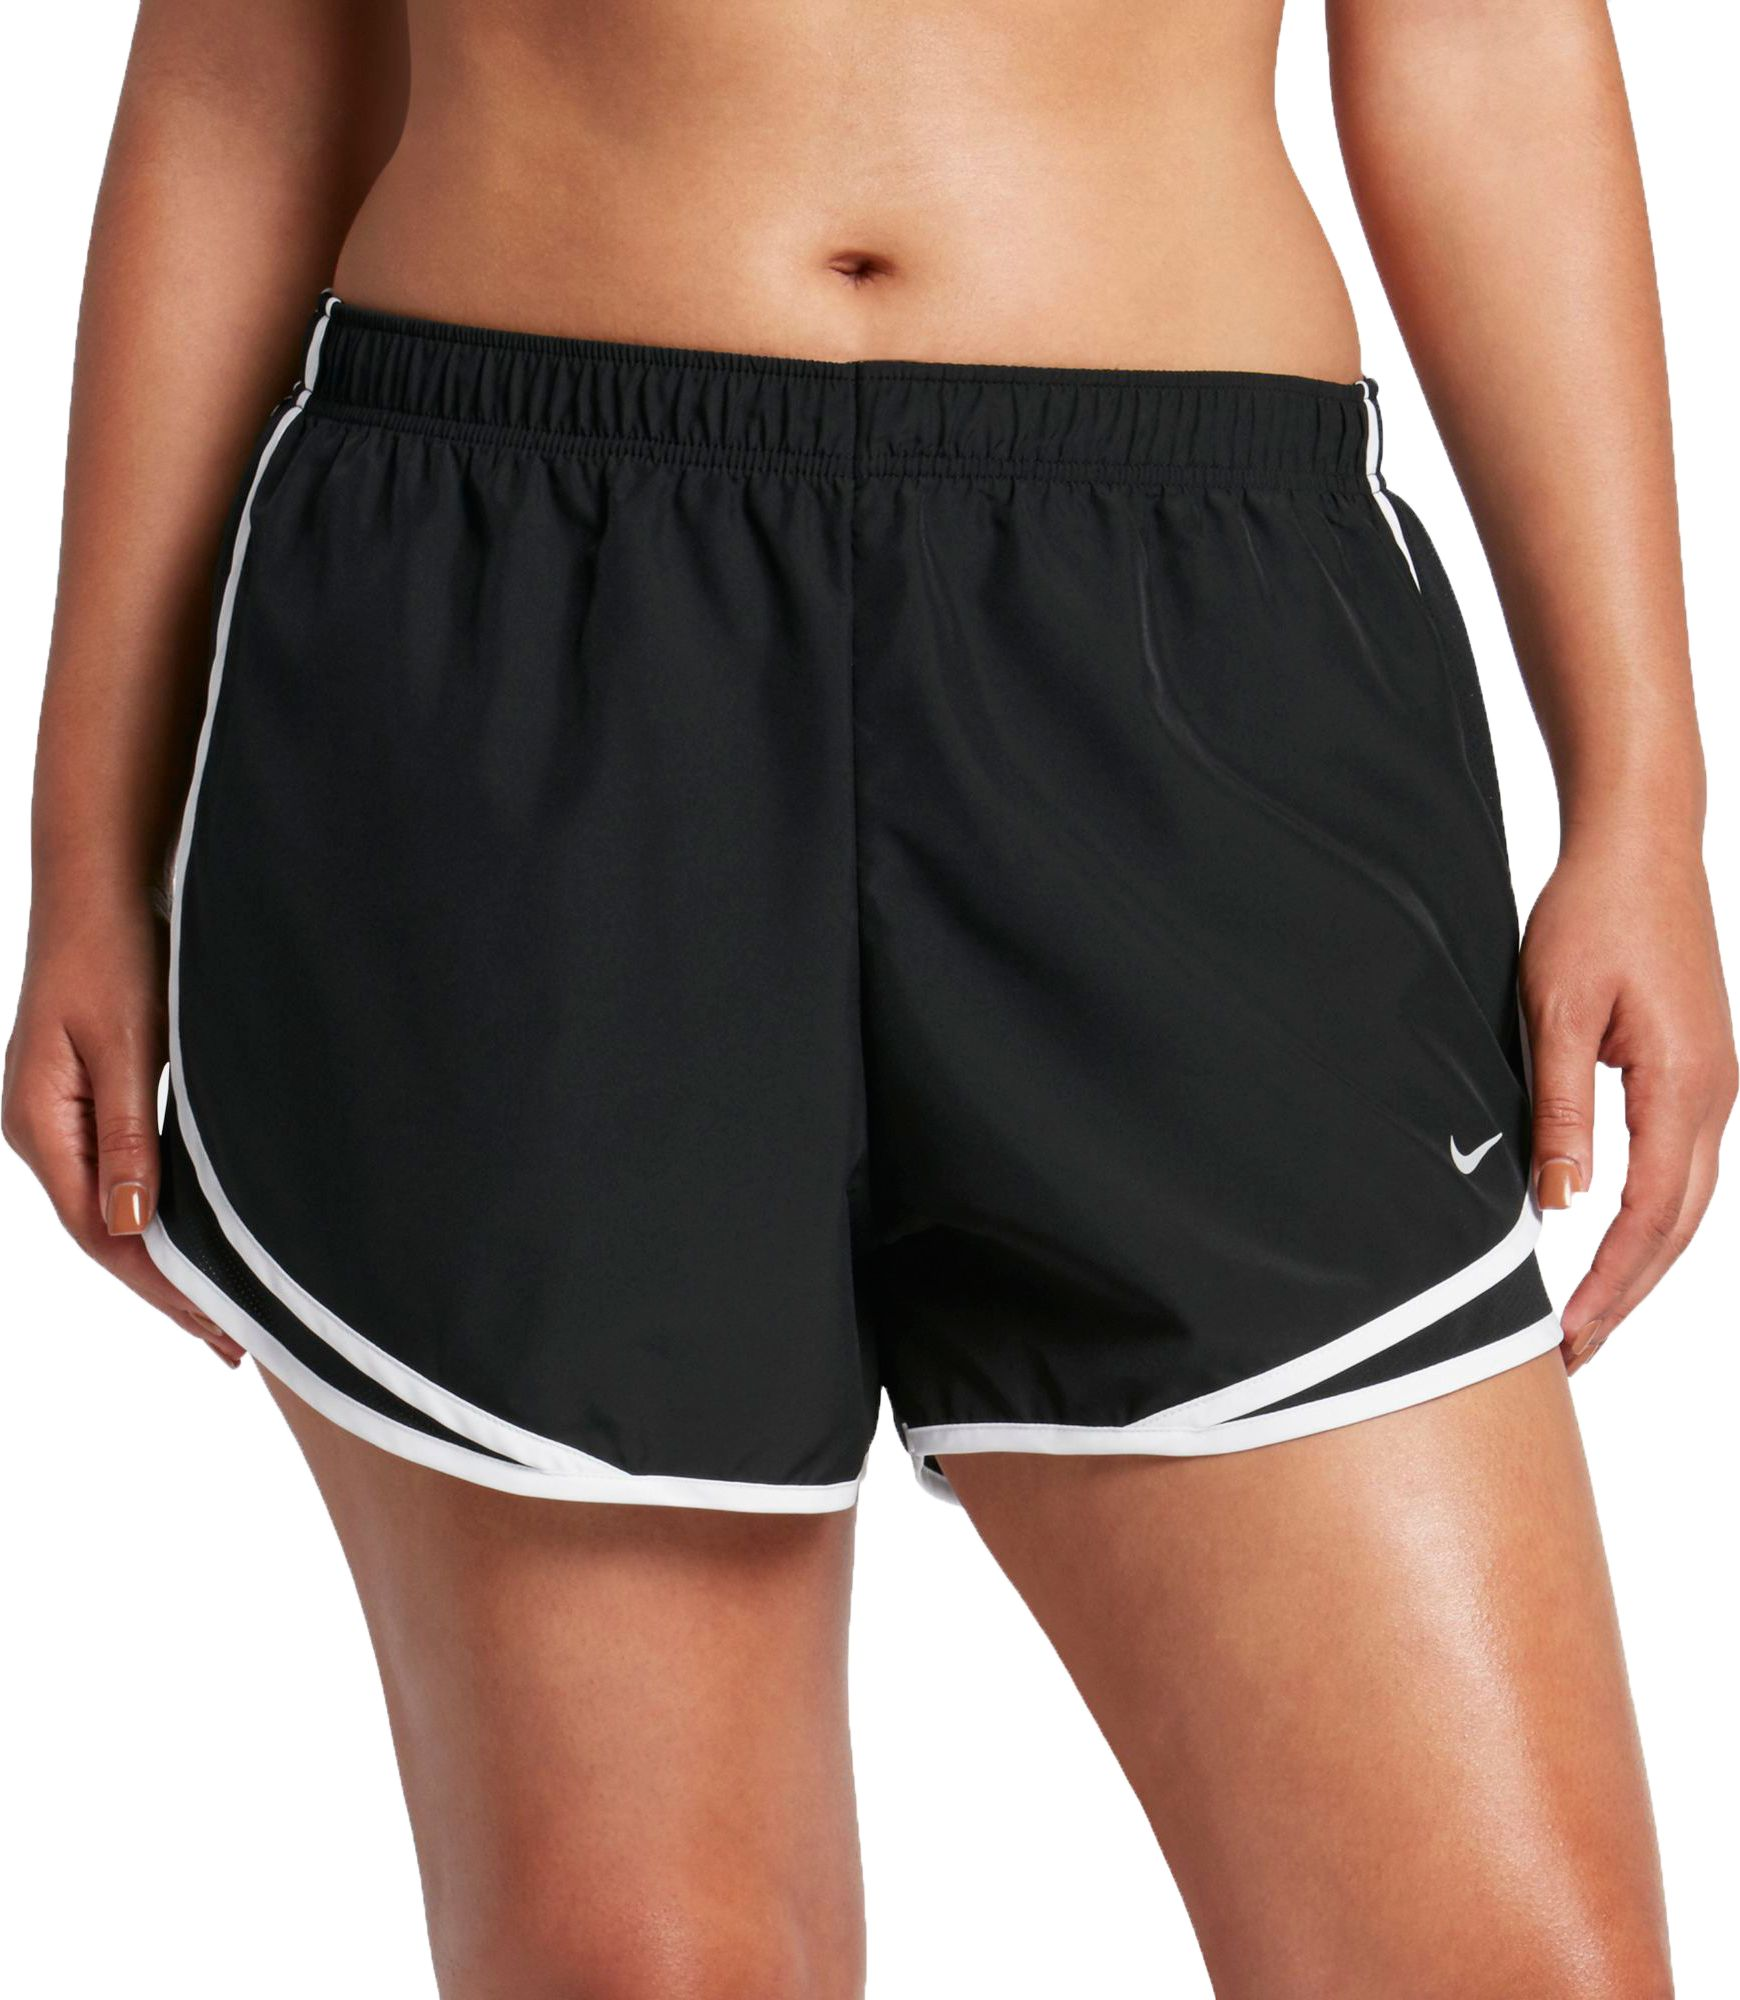 running shorts women noimagefound ??? jhyfsro